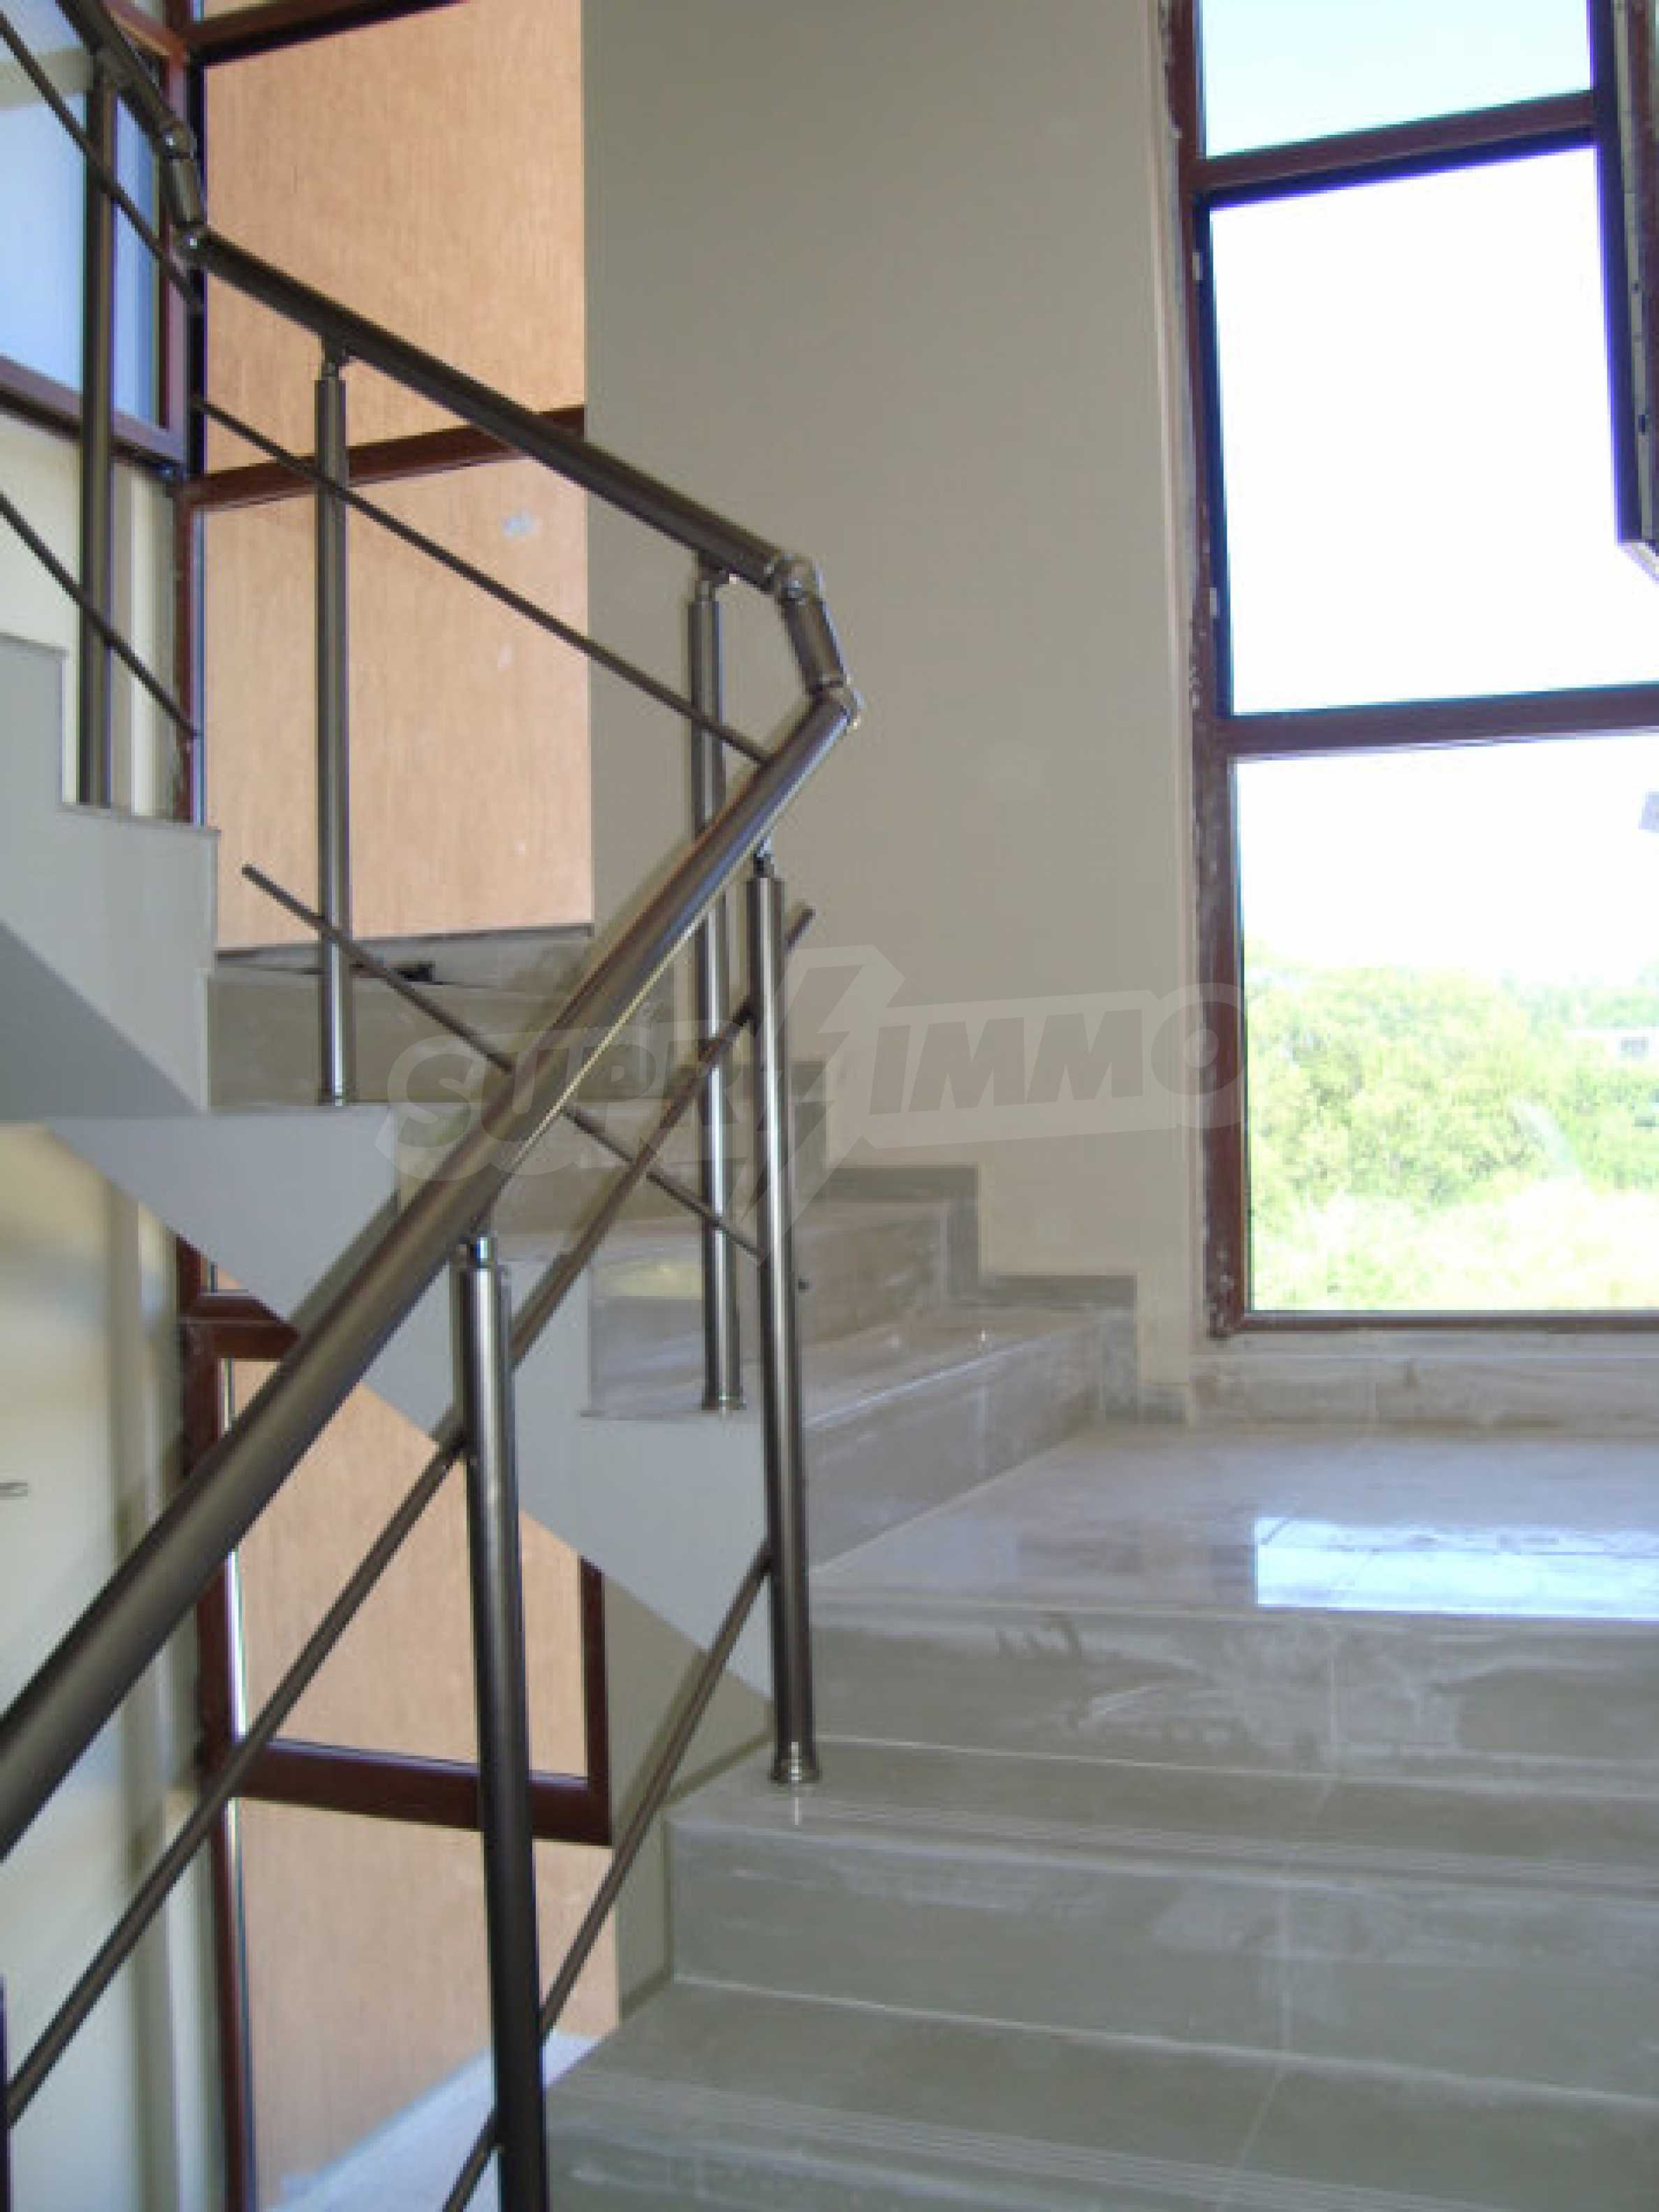 Studios und Apartments im Nestinarka-Komplex in Tsarevo 22